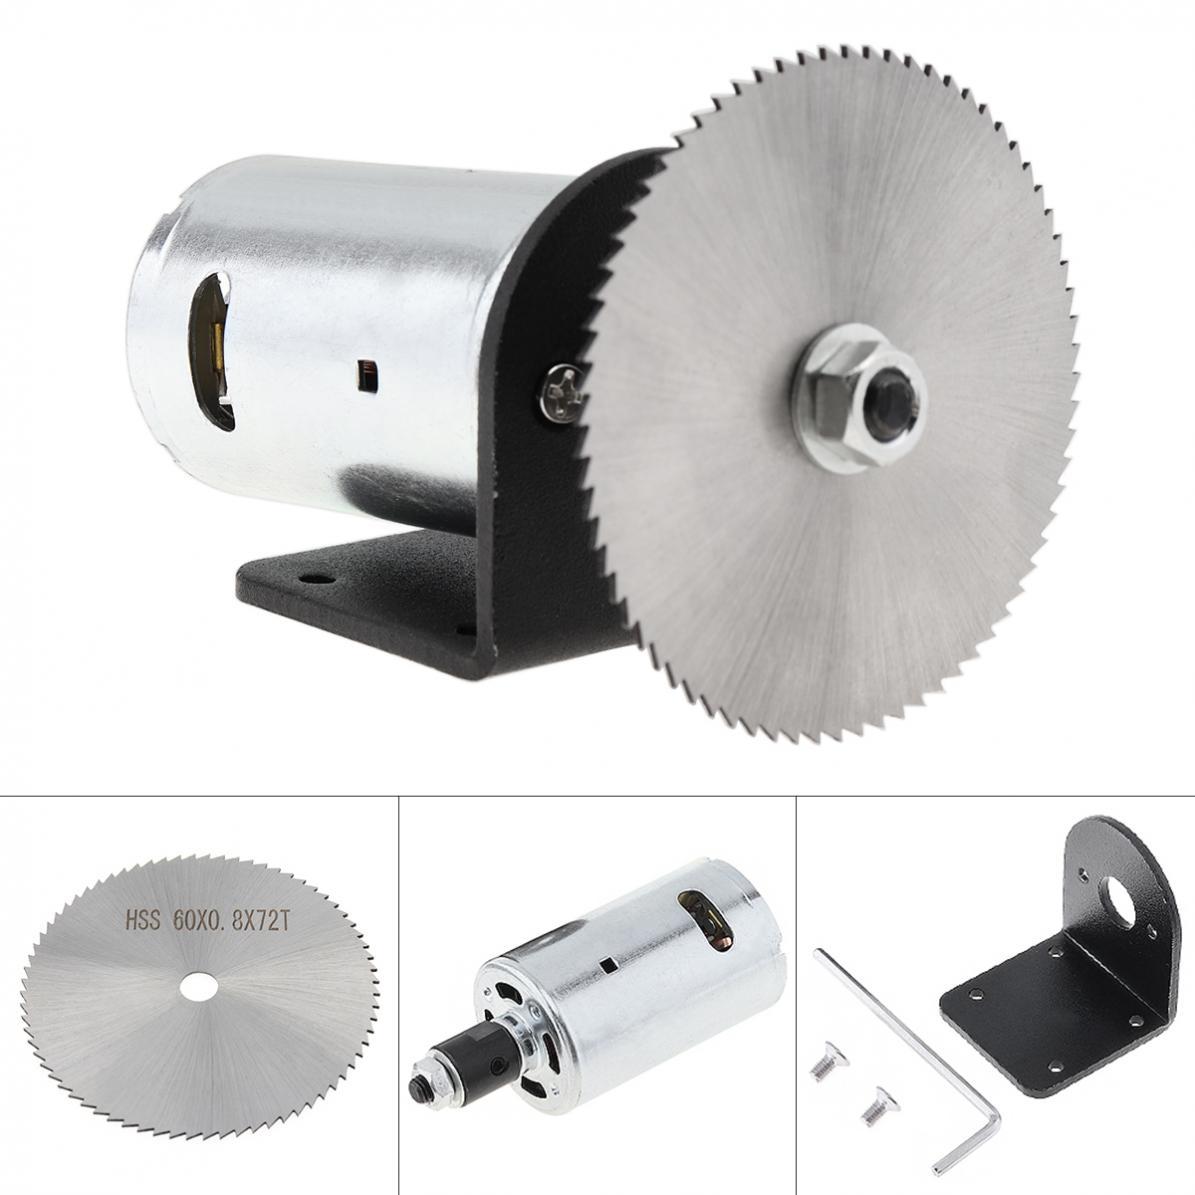 24V 555 Motor Table Circular Saw Kit With Ball Bearing Mounting Bracket And 60mm Saw Blade For Cutting Polishing Engraving